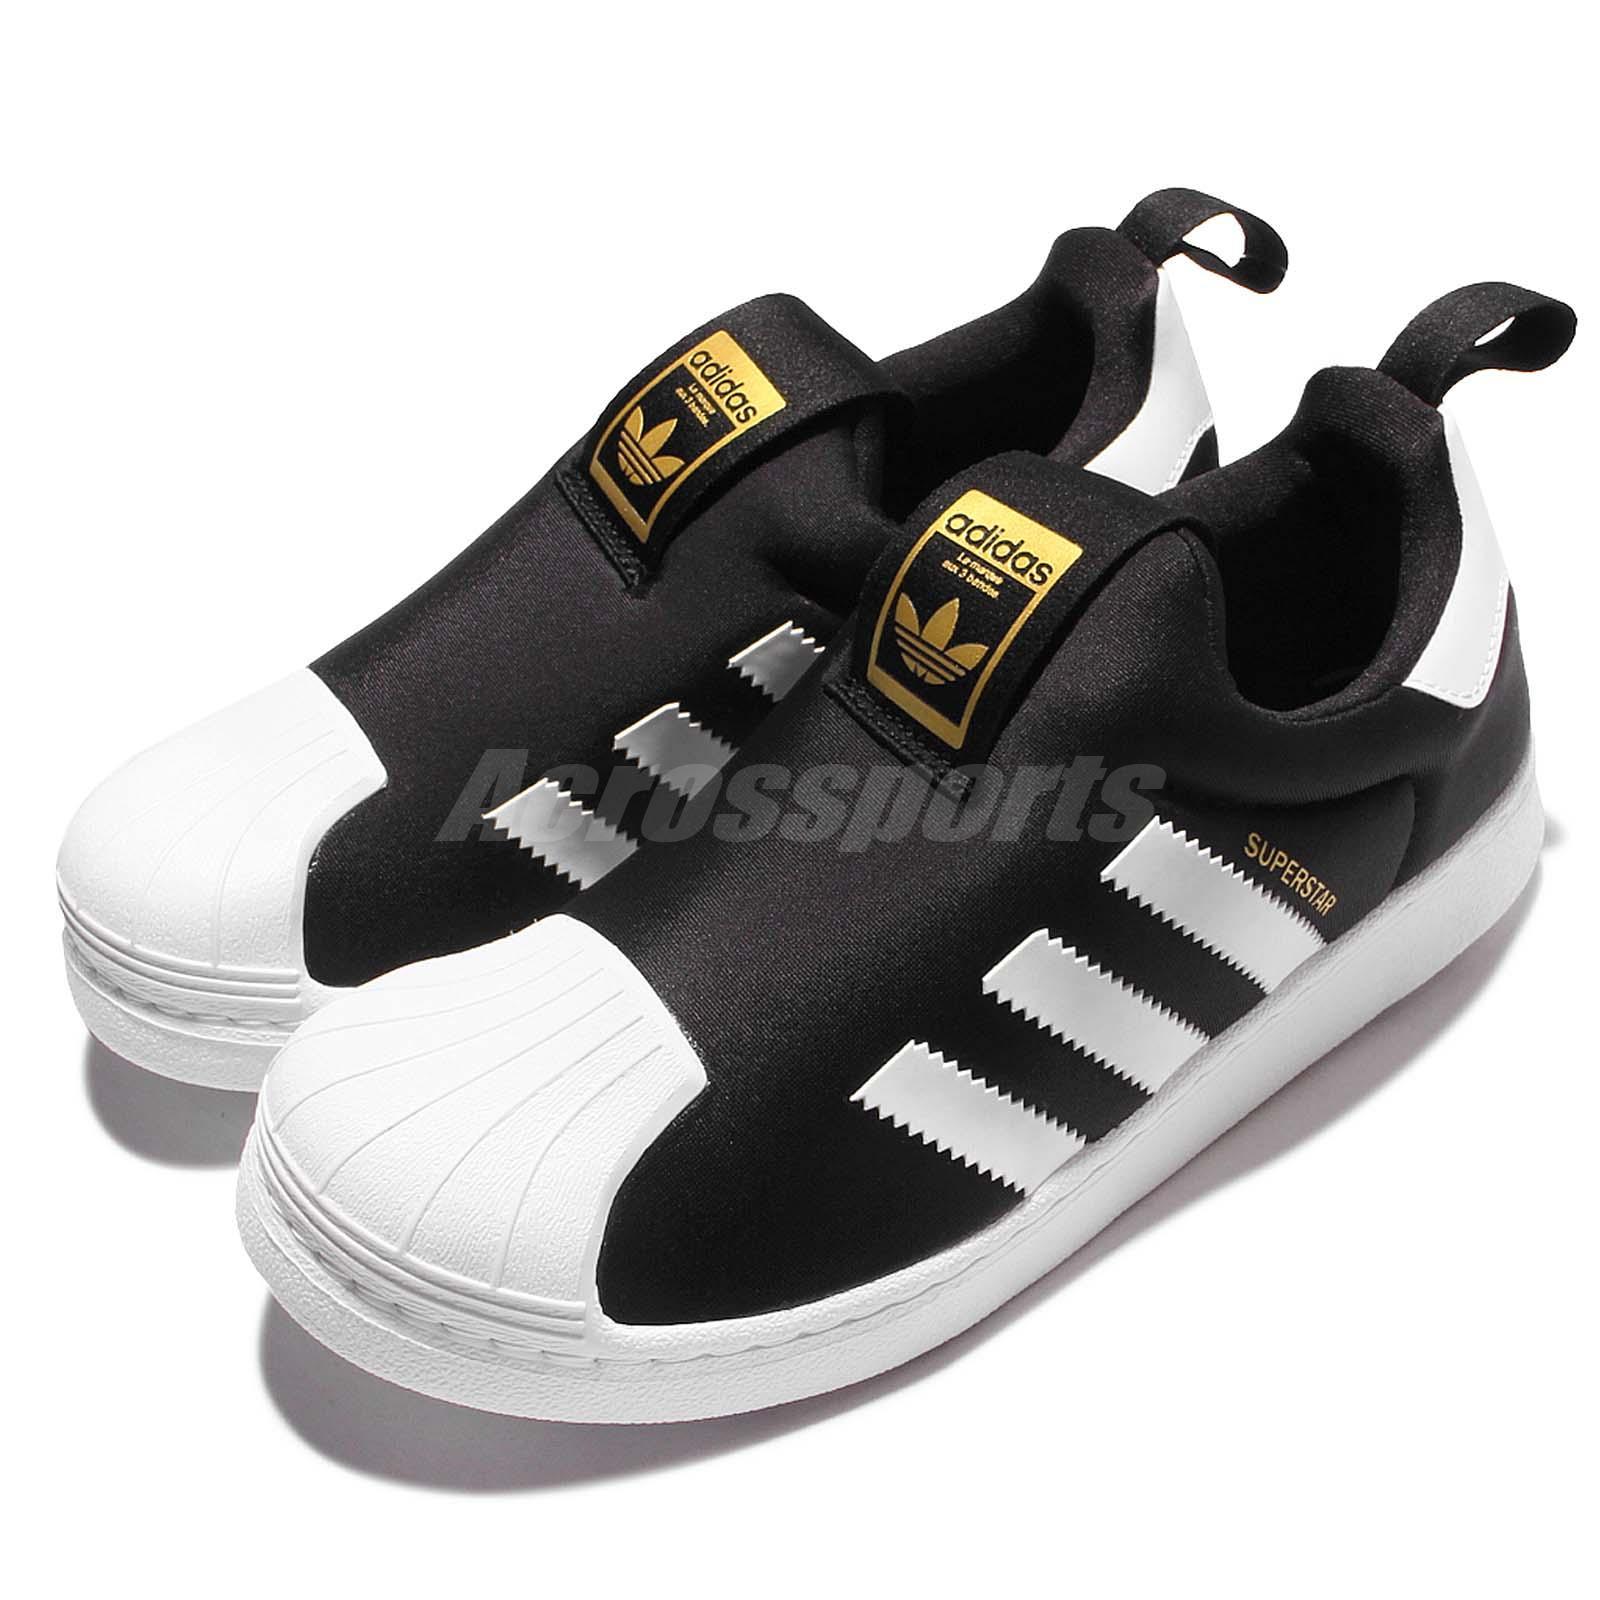 Details about adidas Originals Superstar 360 C Black White Kid Preschool  Slip On Shoes S32130 263f8d6362c